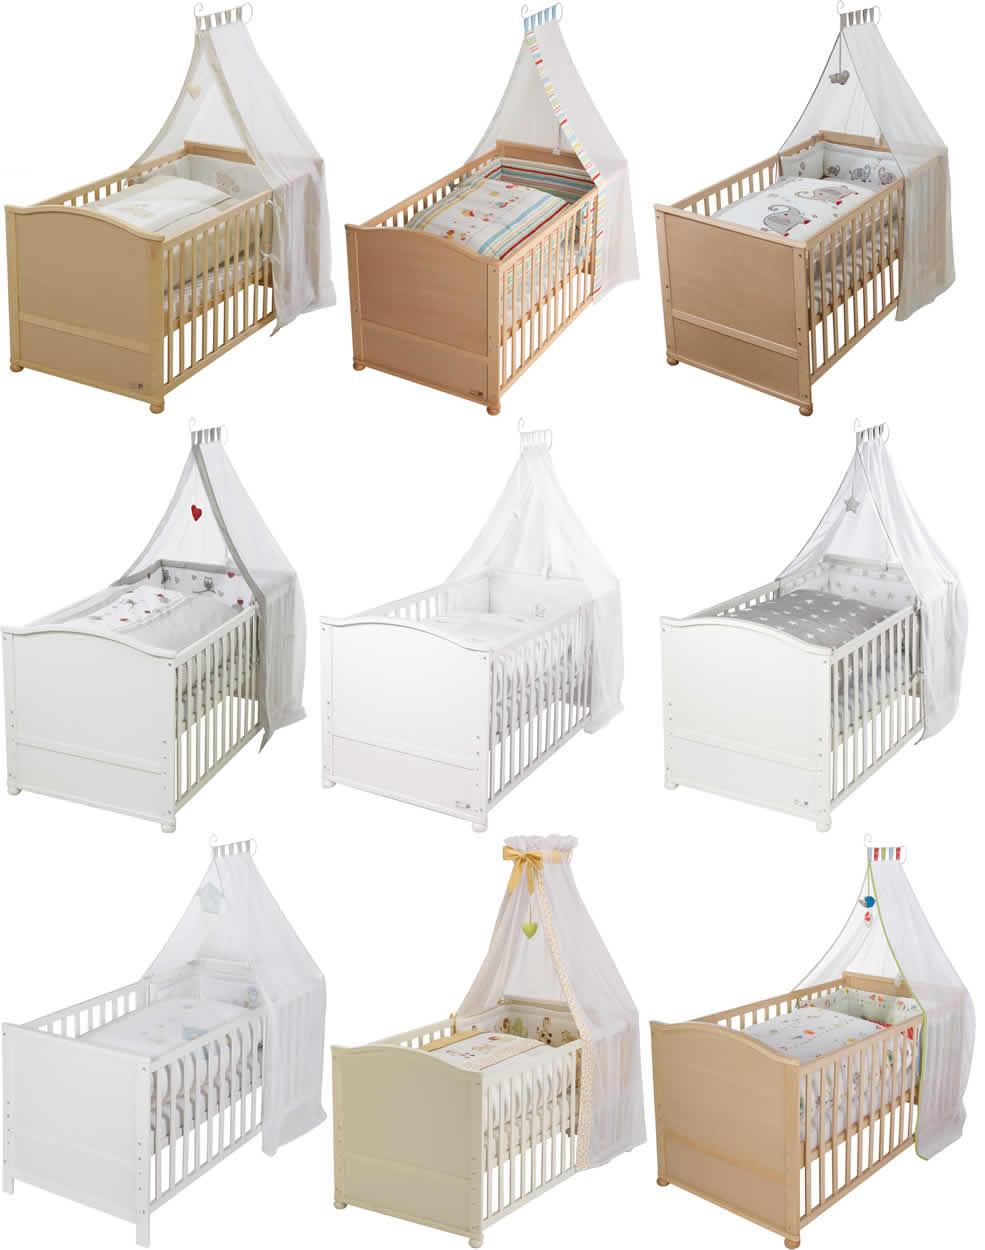 Full Size of Roba Bett Komplettbettset Kinderbett Babybett Juniorbett 70x140 Cm Topper Japanische Betten Modernes 180x200 Mit Lattenrost Matratze Und Massivholz Barock Bett Roba Bett